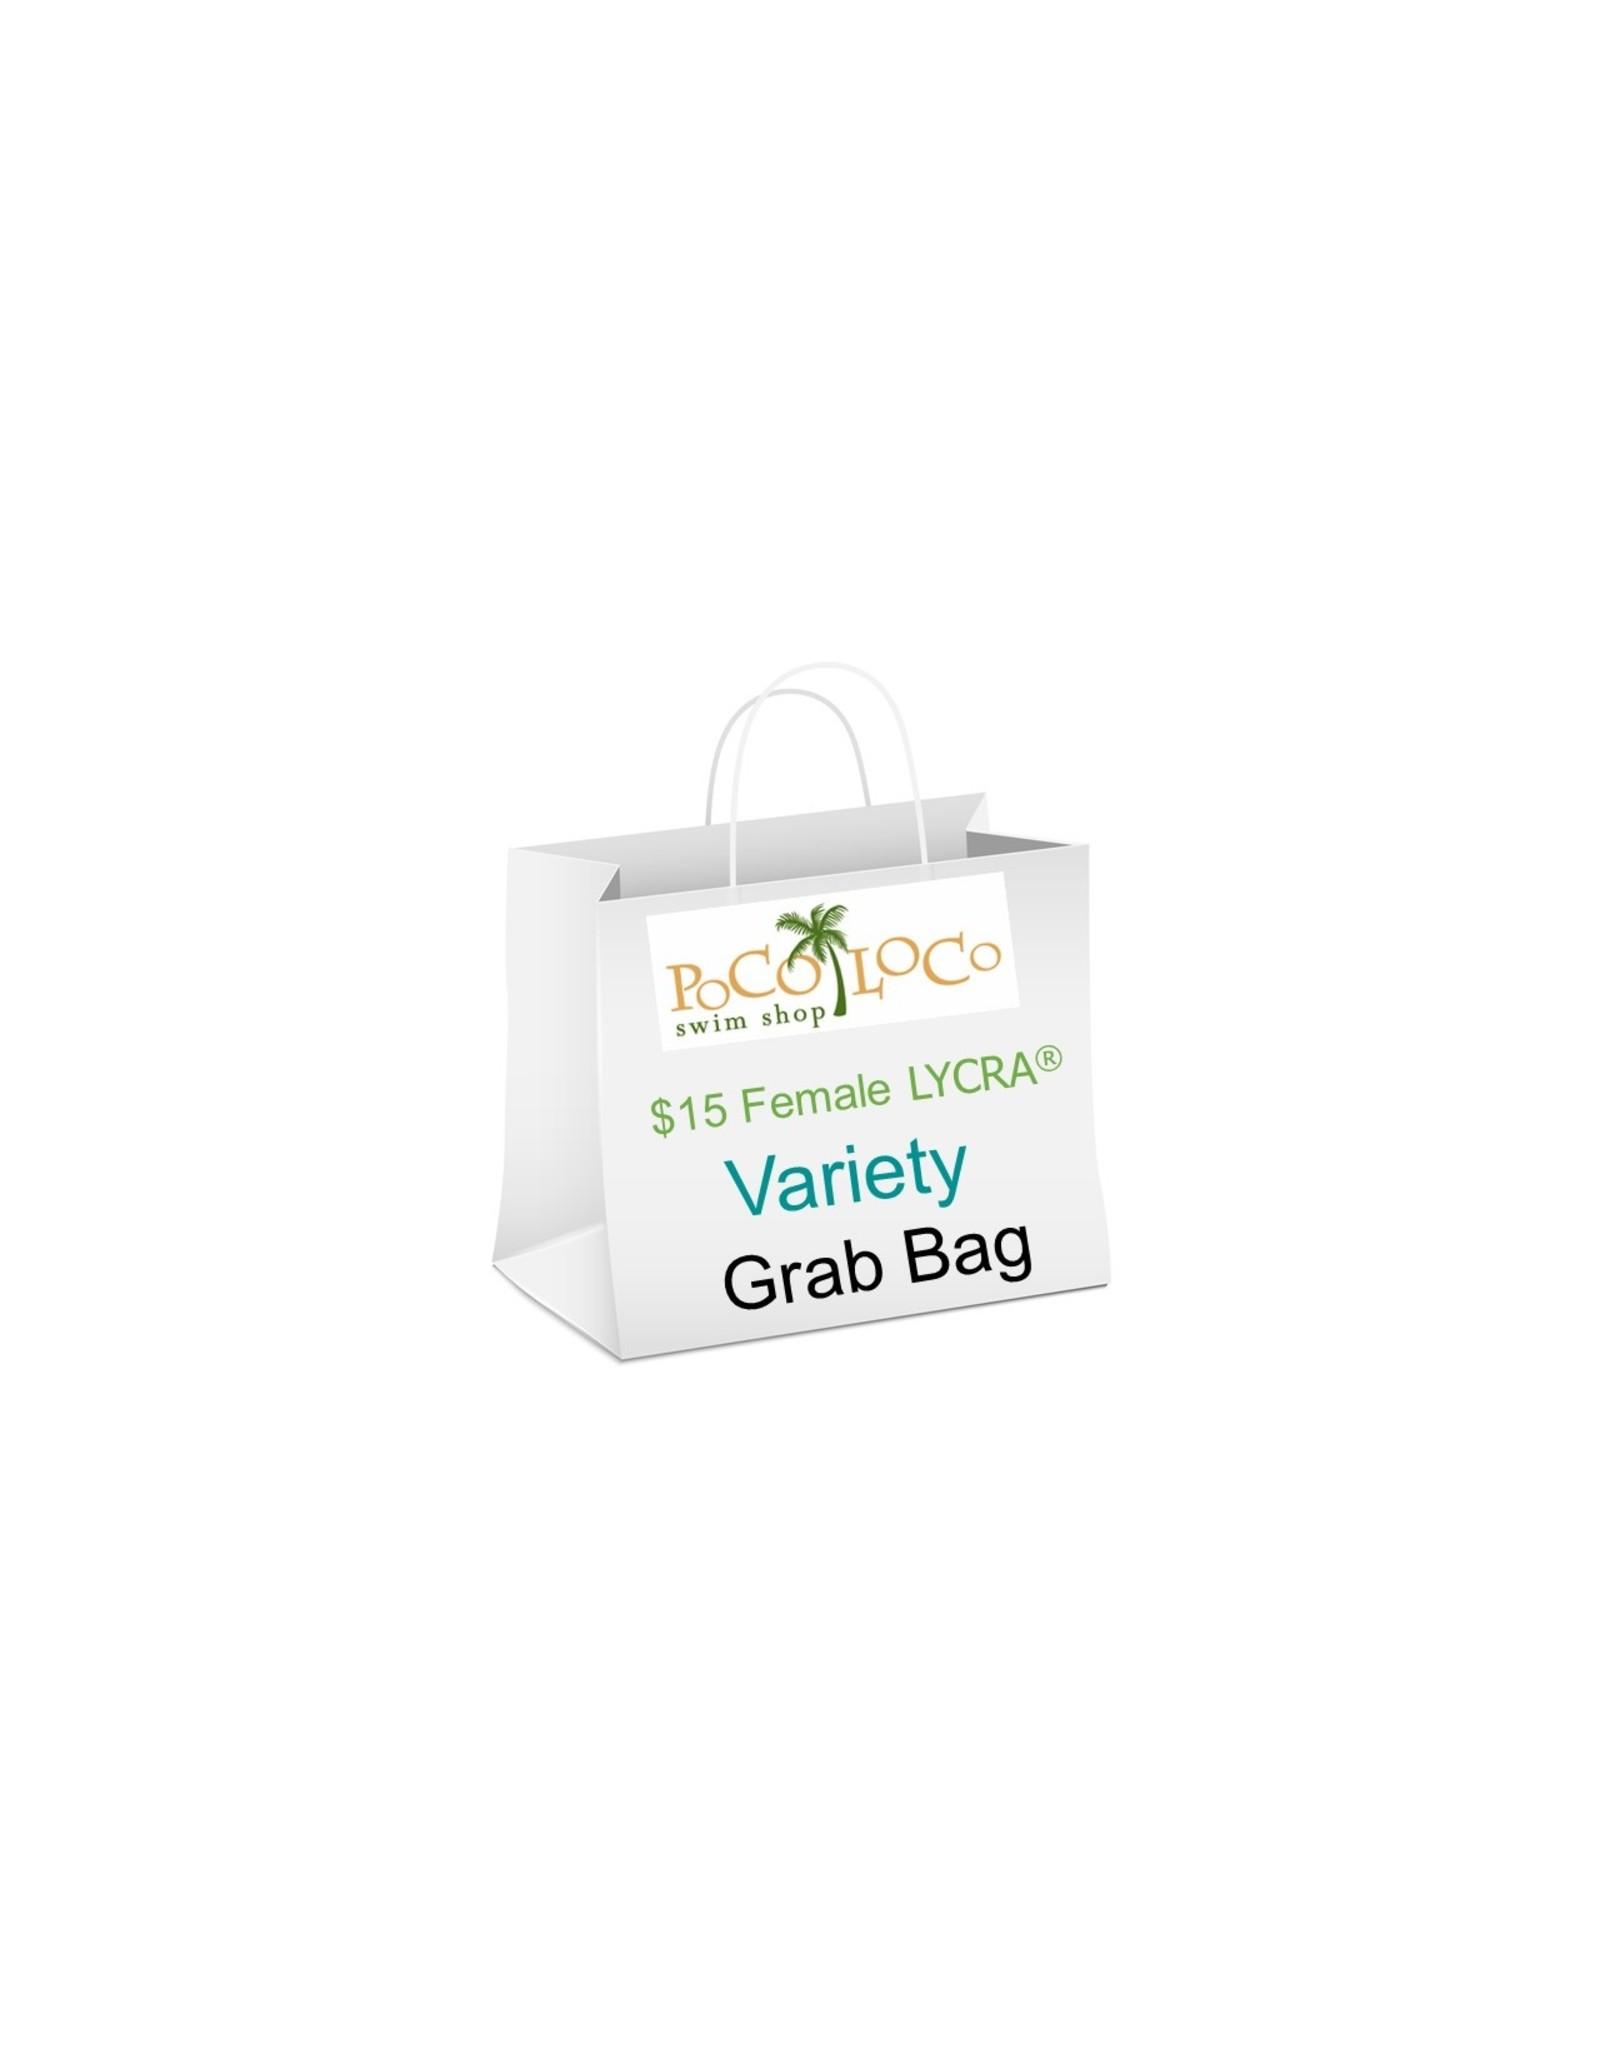 LYCRA® VARIETY GRAB BAG SUIT